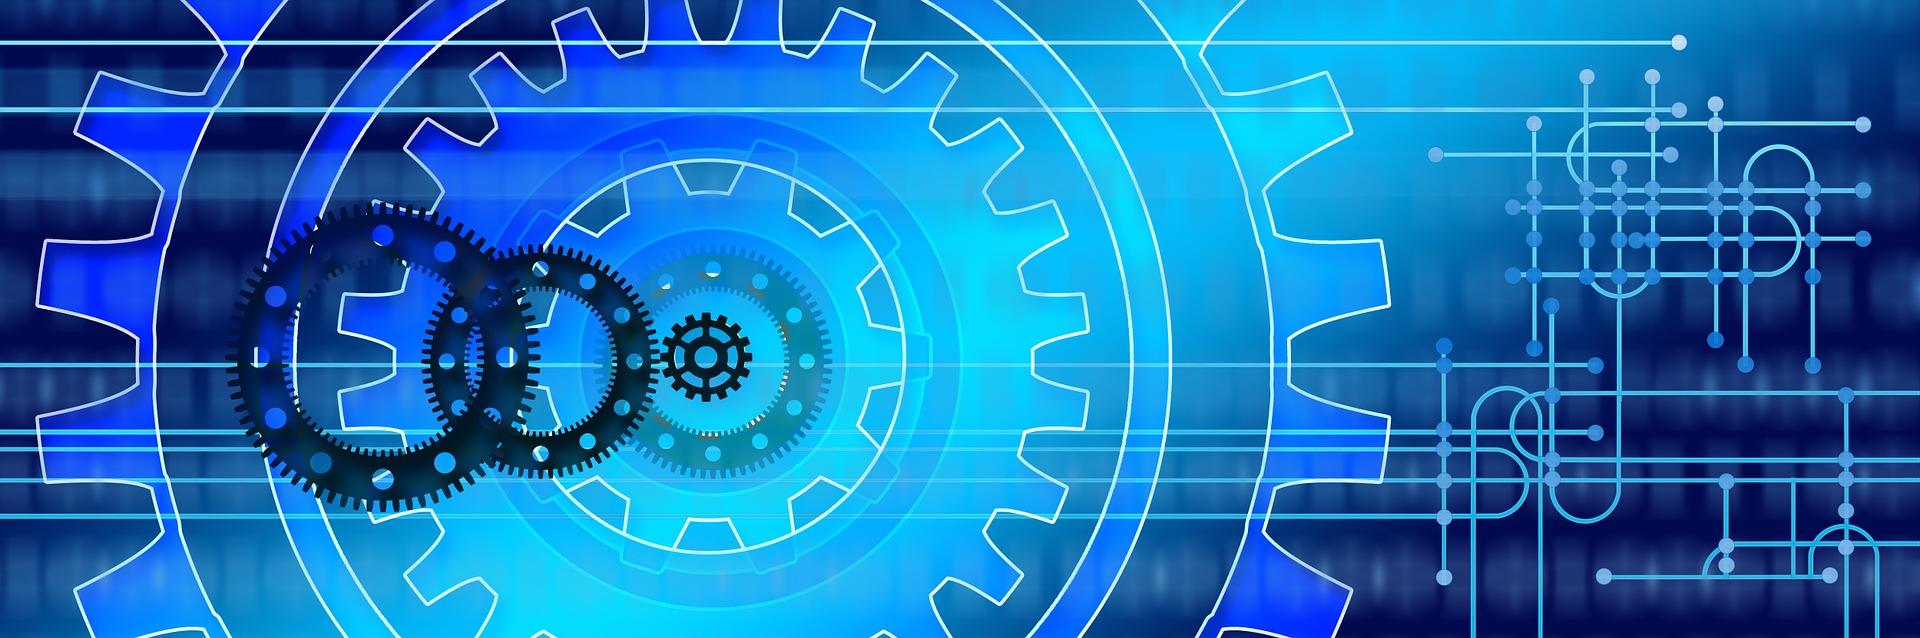 Industrie 4.0: Das Potenzial steigt